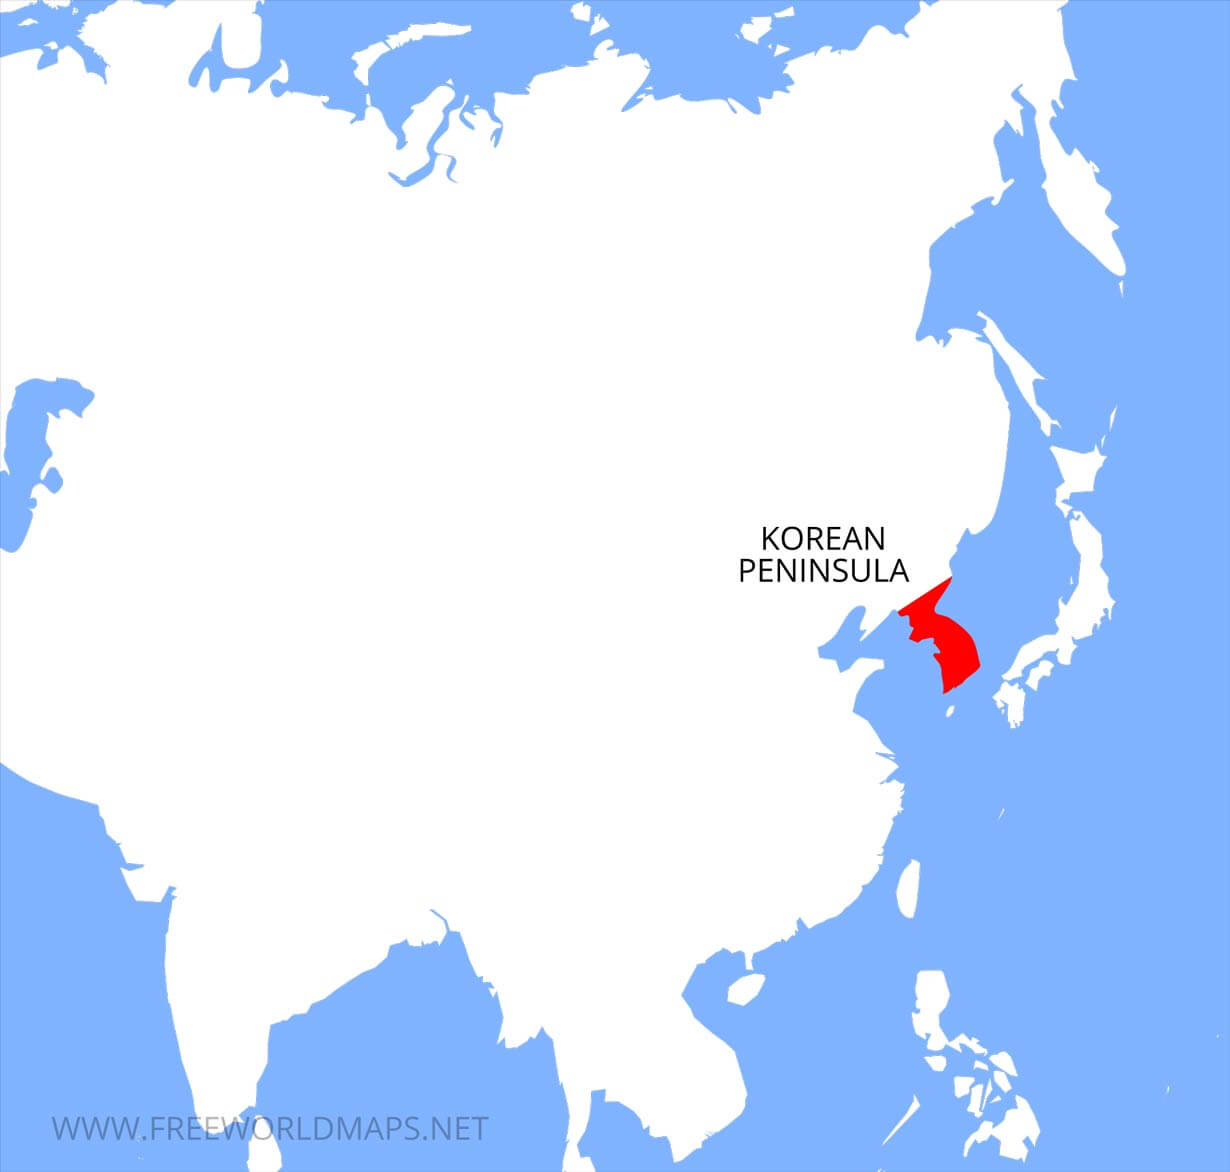 Korean Peninsula On World Map Korean Peninsula maps